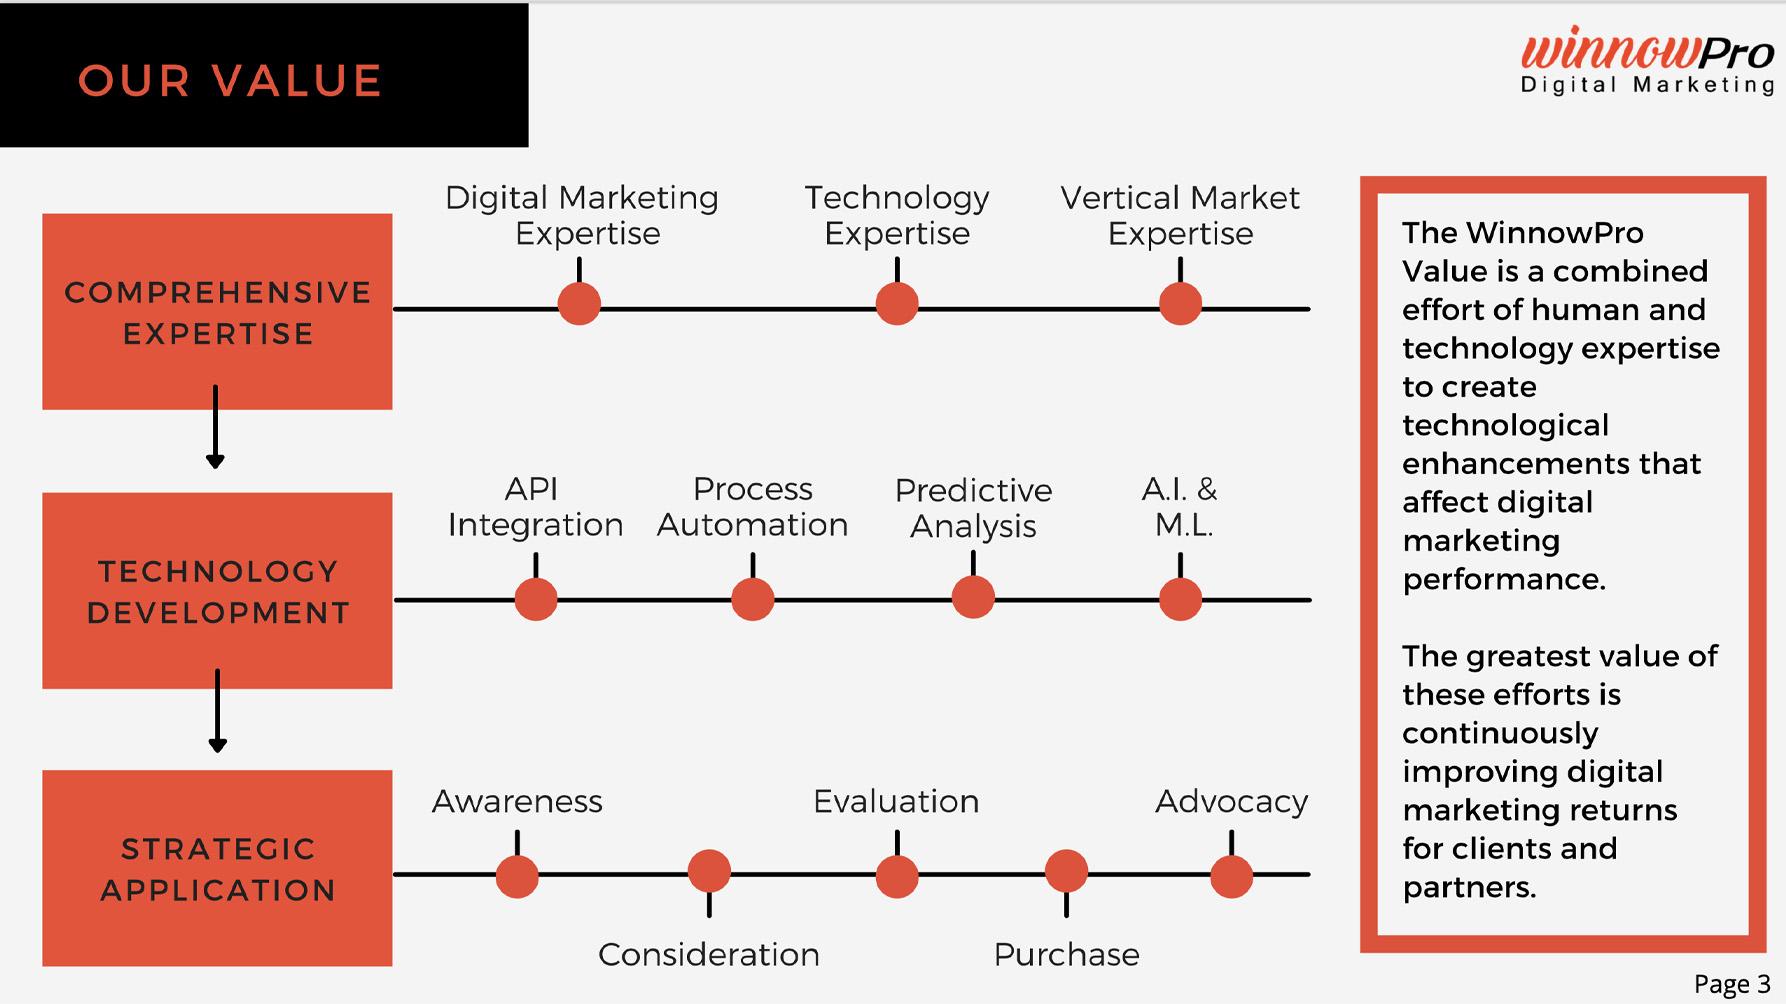 Image of WinnowPro's Value principles